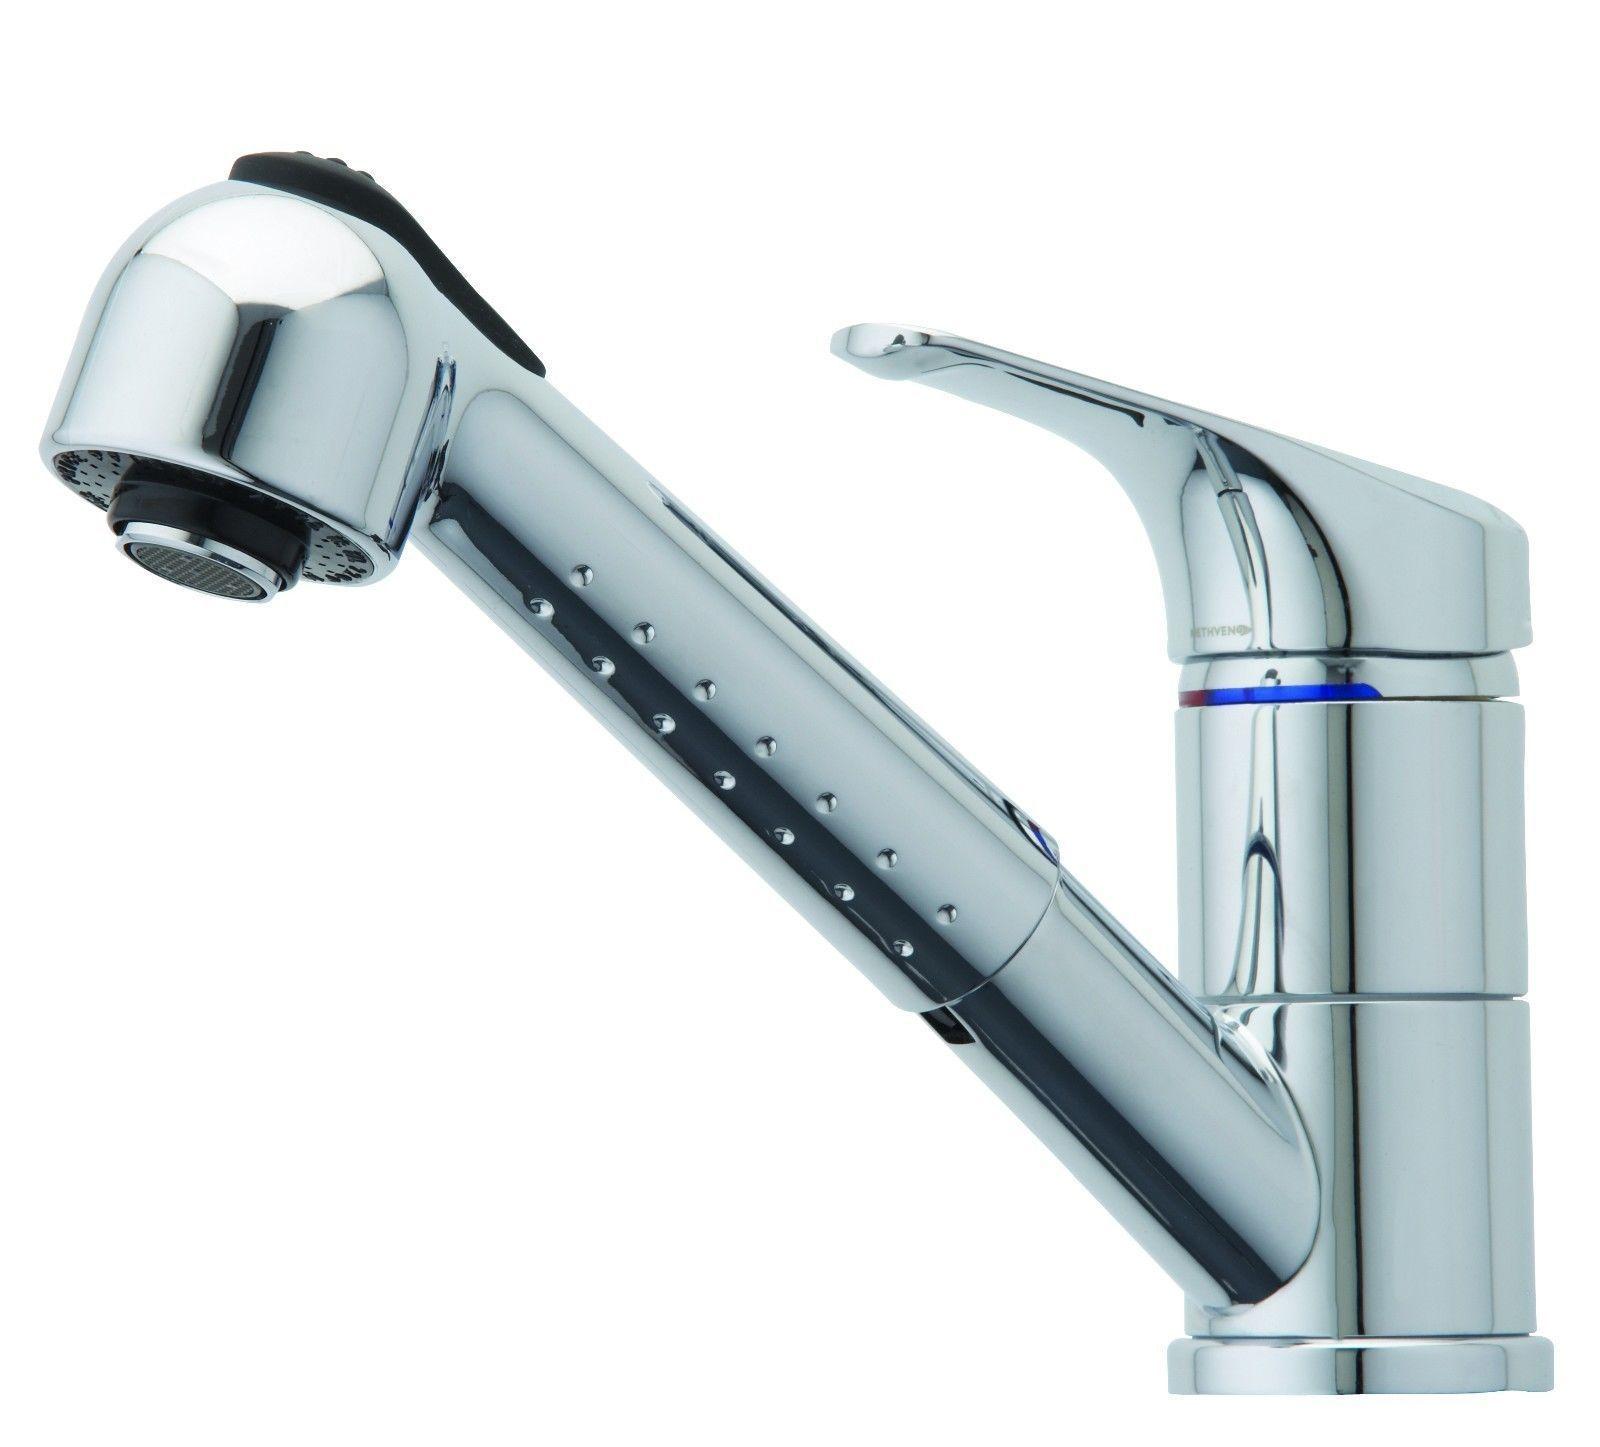 Bathroom sinks bunnings | ideas | Pinterest | Sinks, Bathroom trends ...